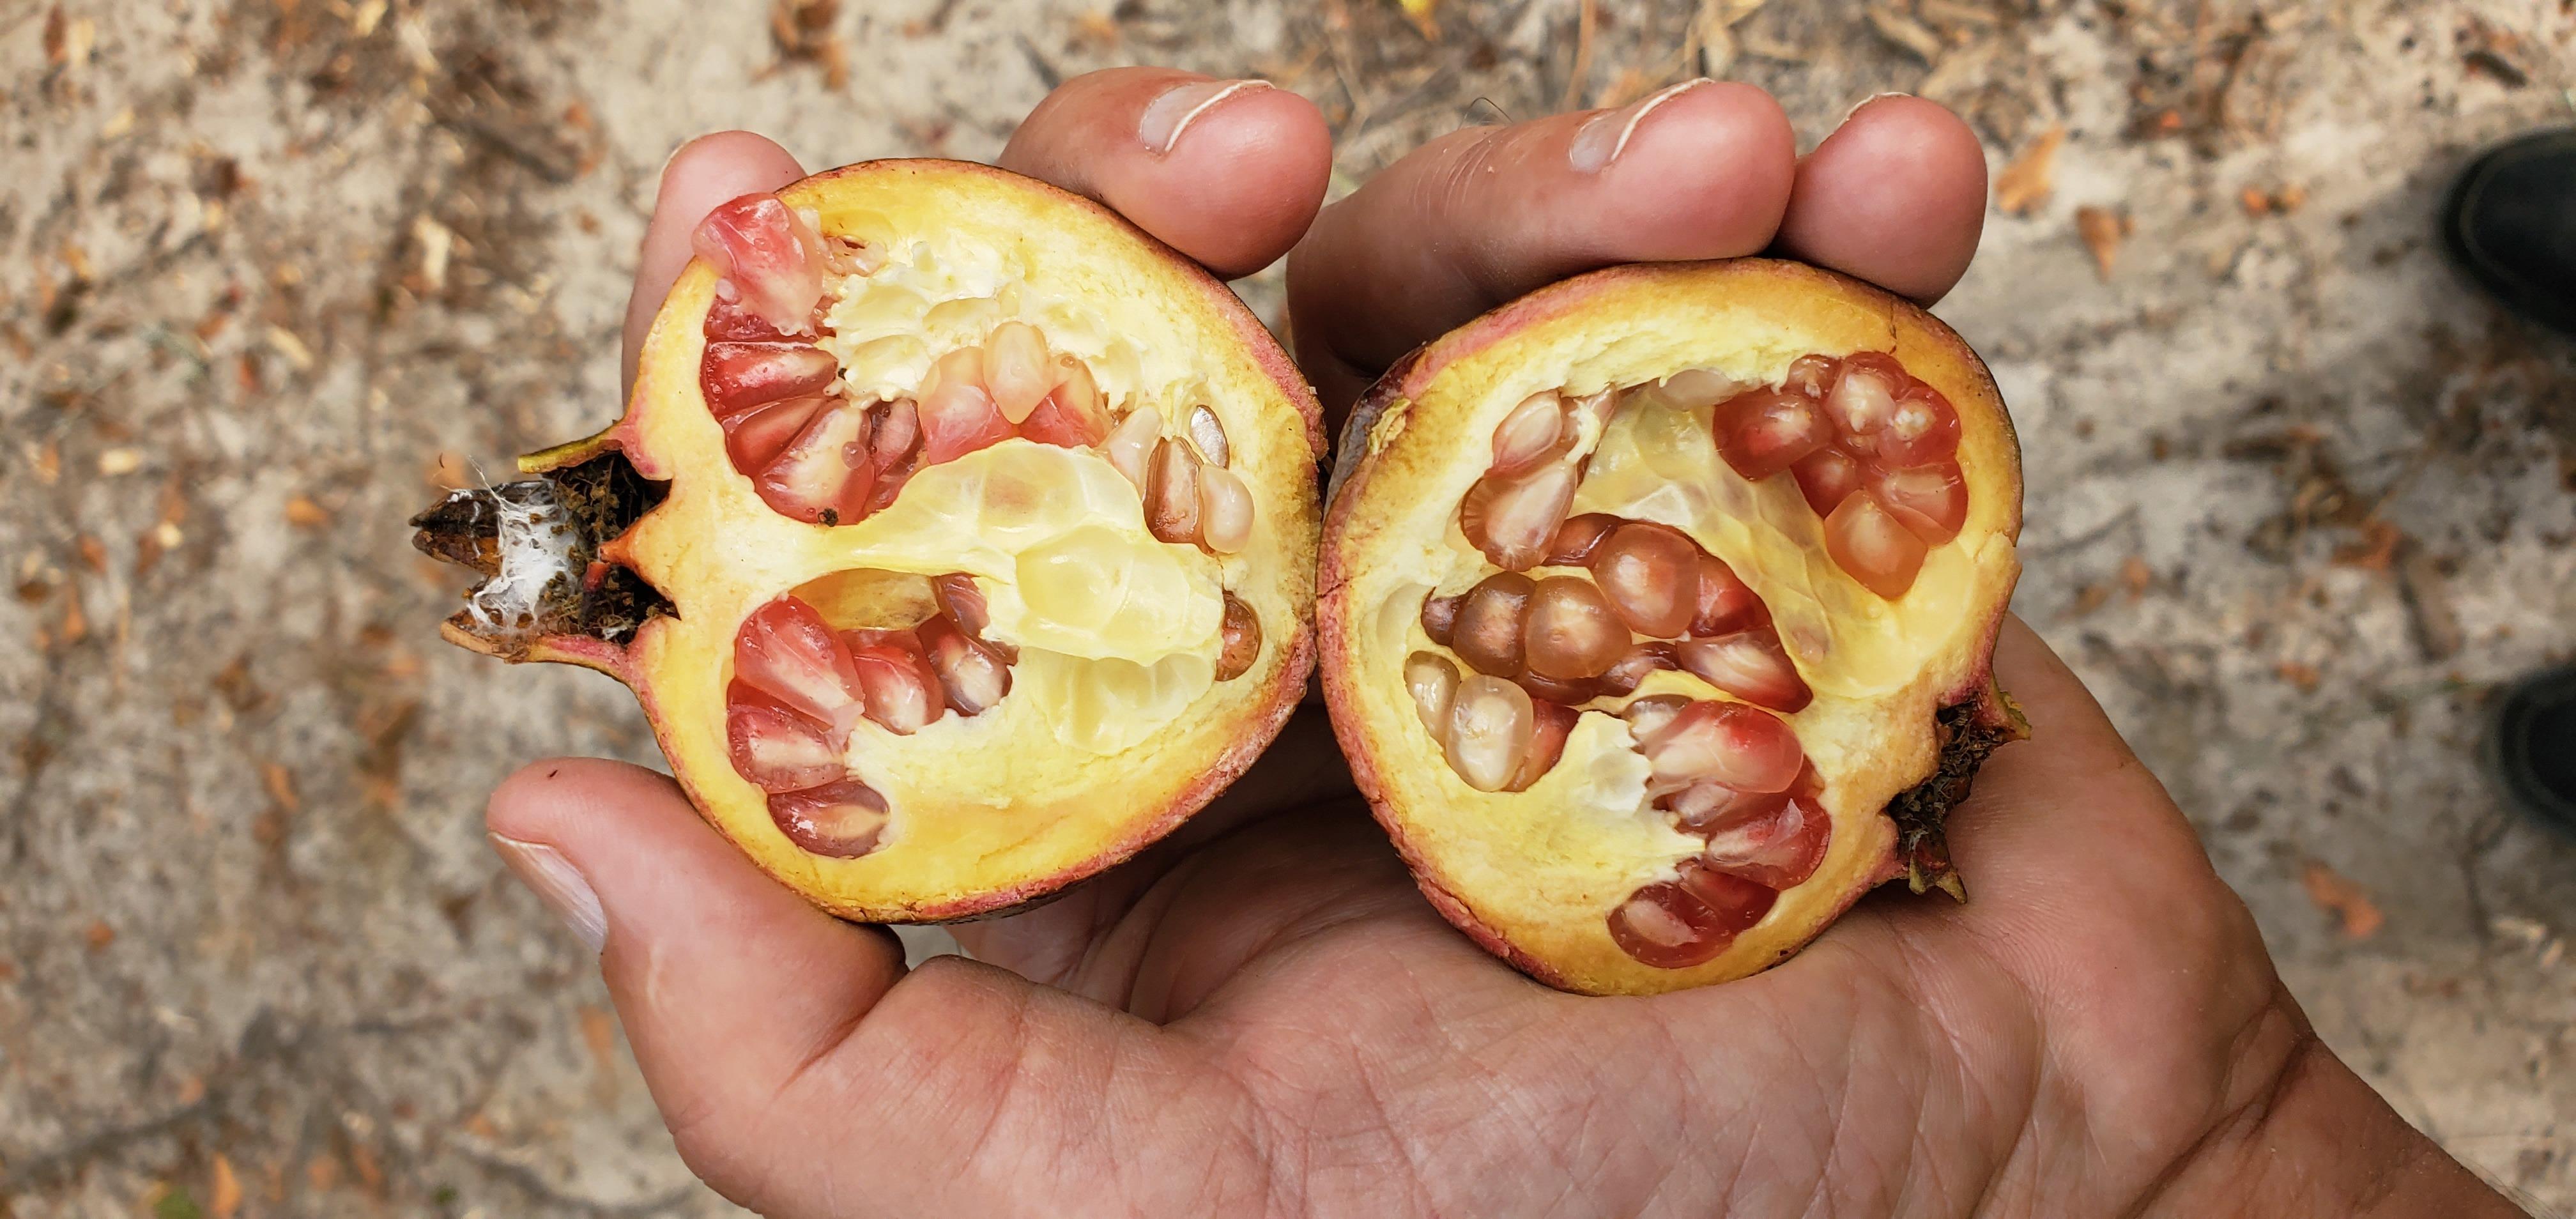 4032x1908 Only one, but we grew it, Inside, in Pomegranate, by John S. Quarterman, for OkraParadiseFarms.com, 7 October 2019